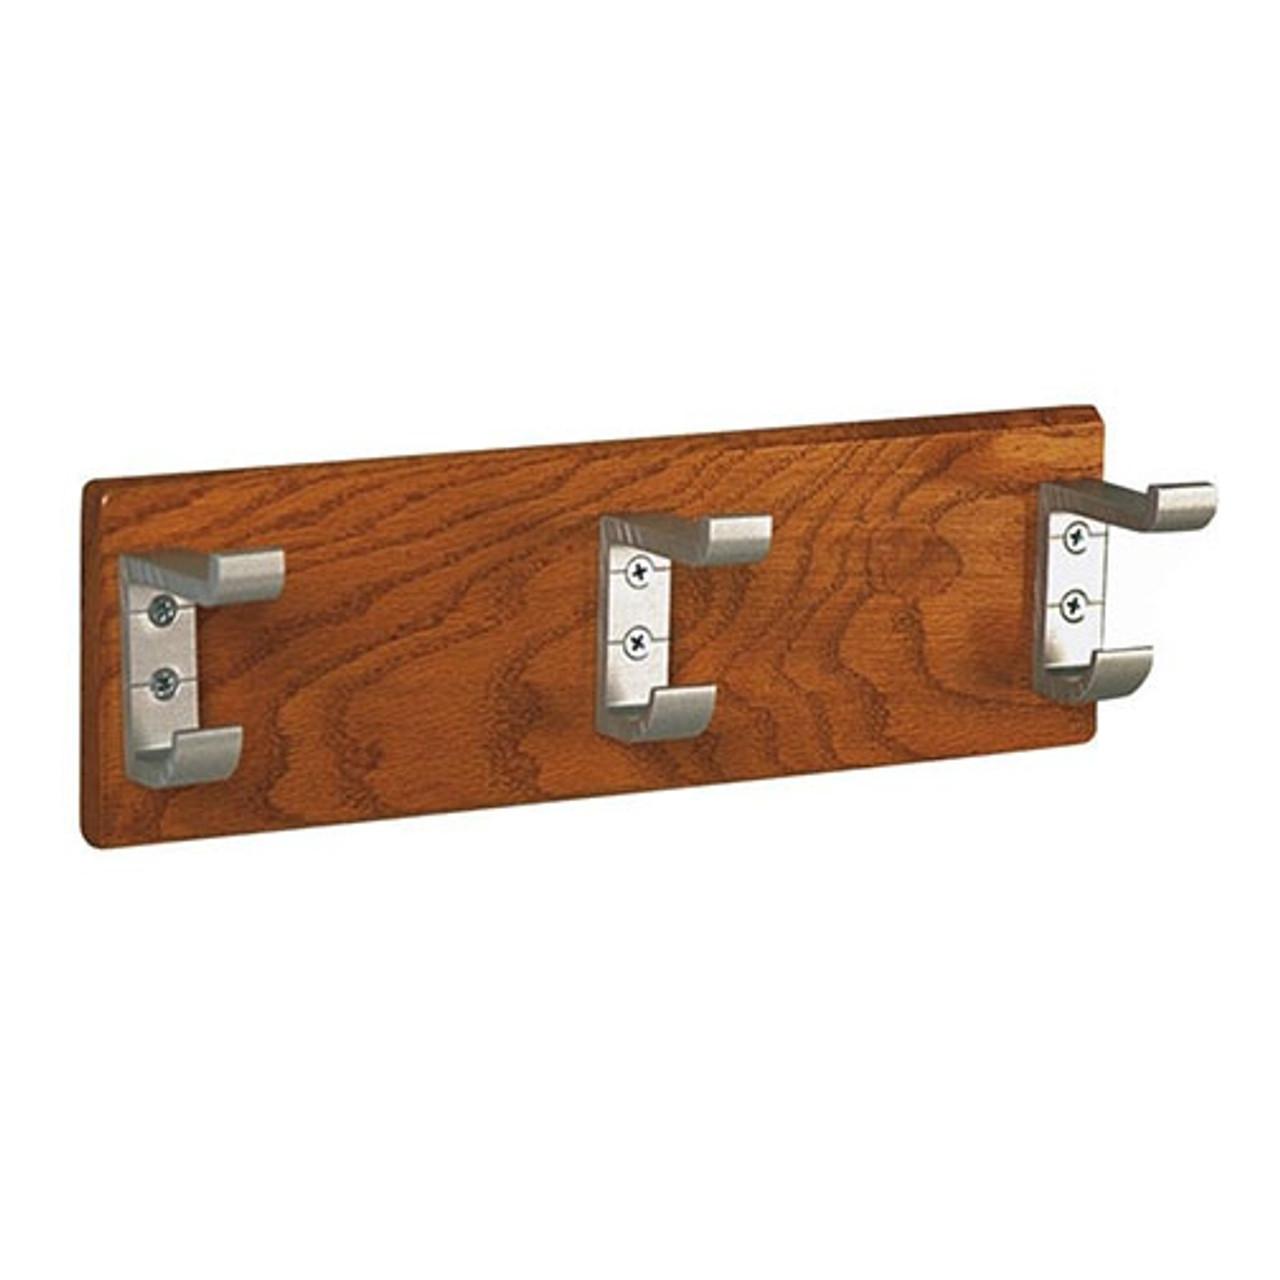 Wall Coat Racks - No Shelf - Wood